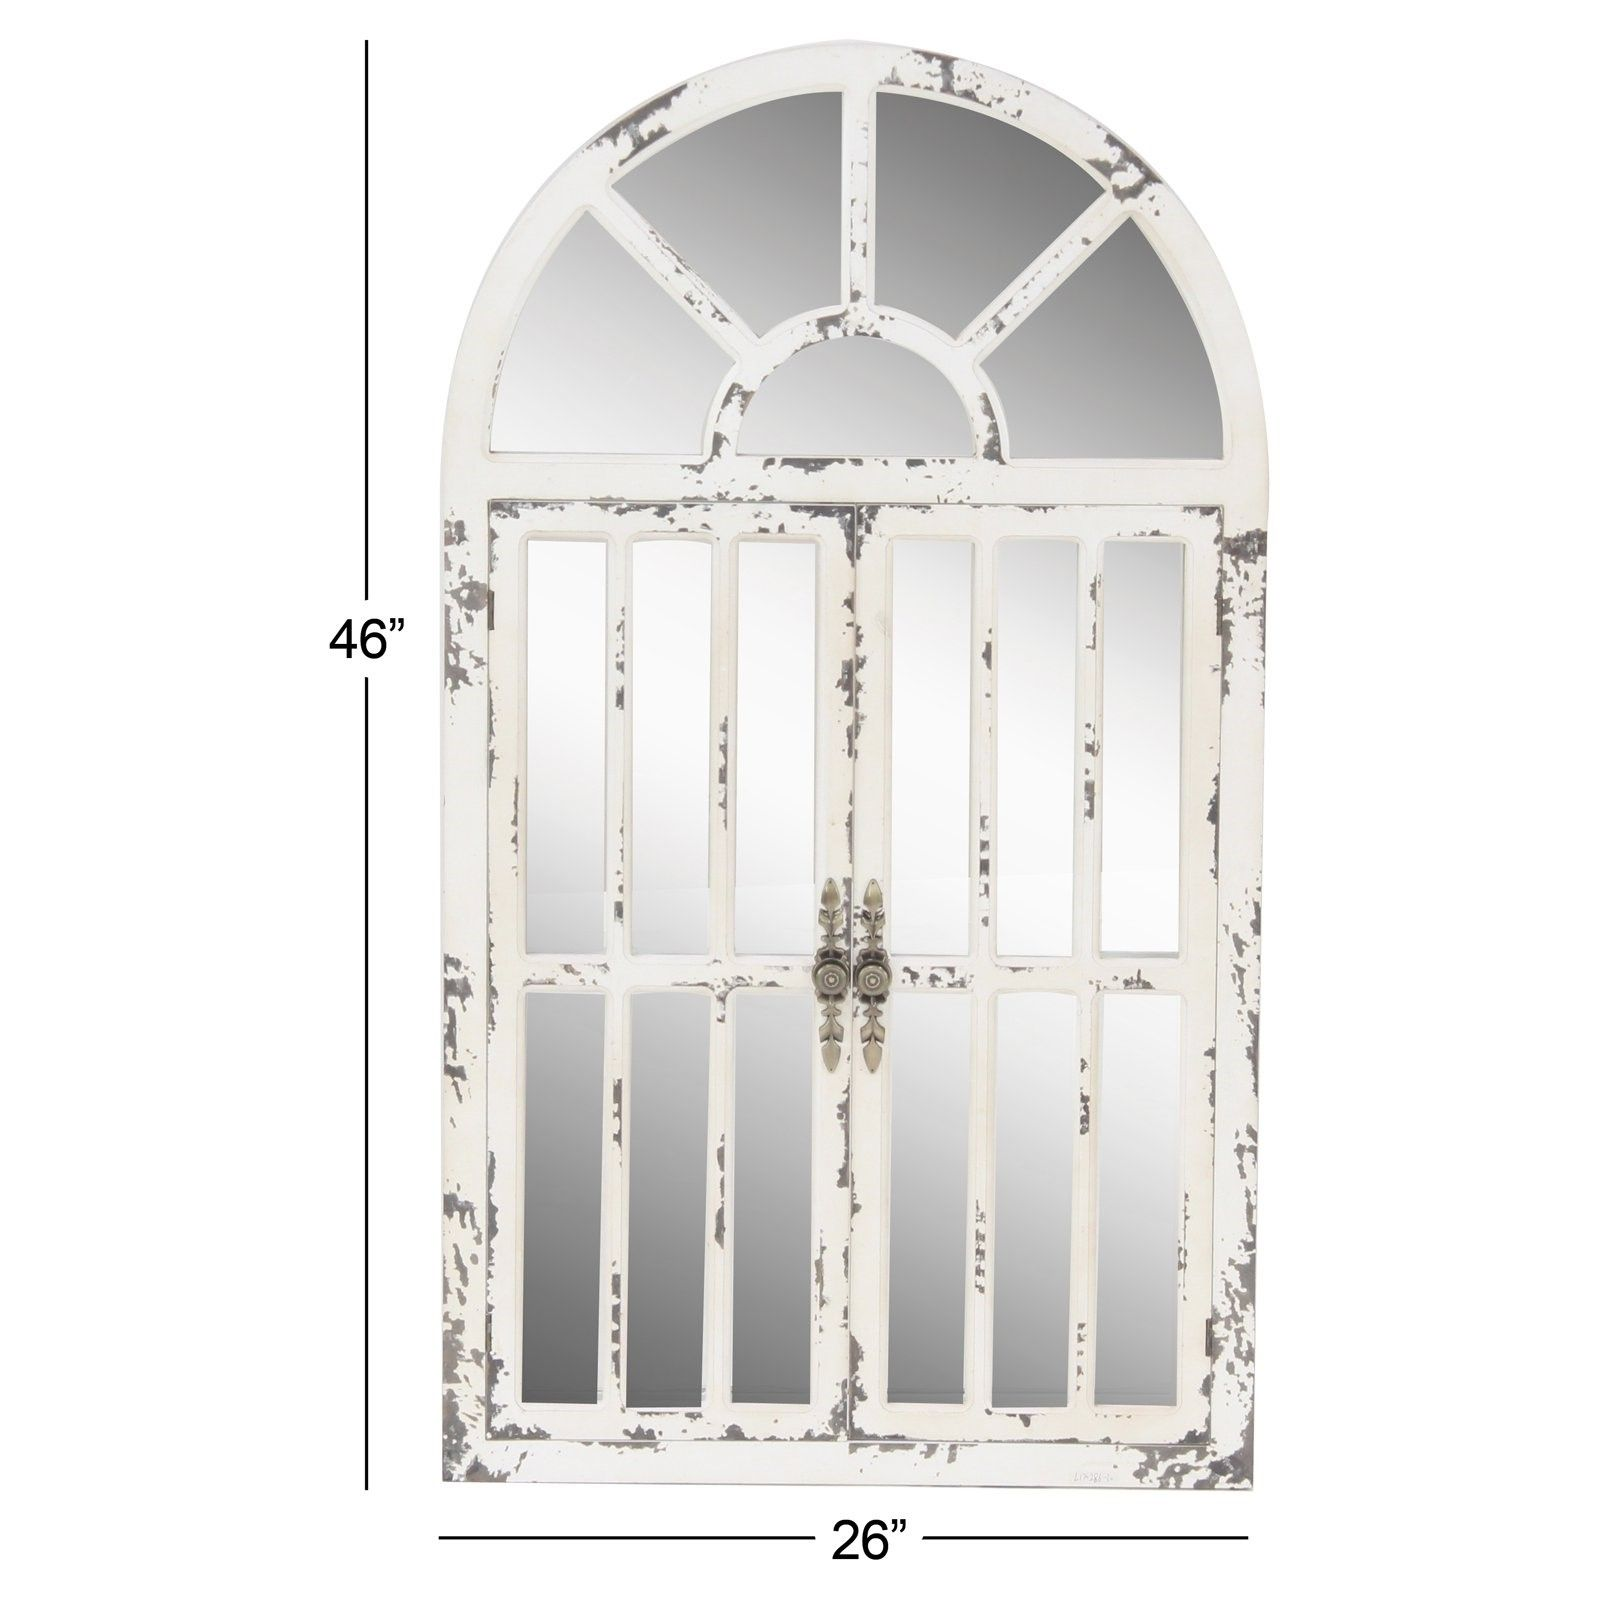 Decmode Distressed White Wooden Arched Window Wall Mirror 26w X 46h In In 2020 Window Wall Arched Windows Mirror